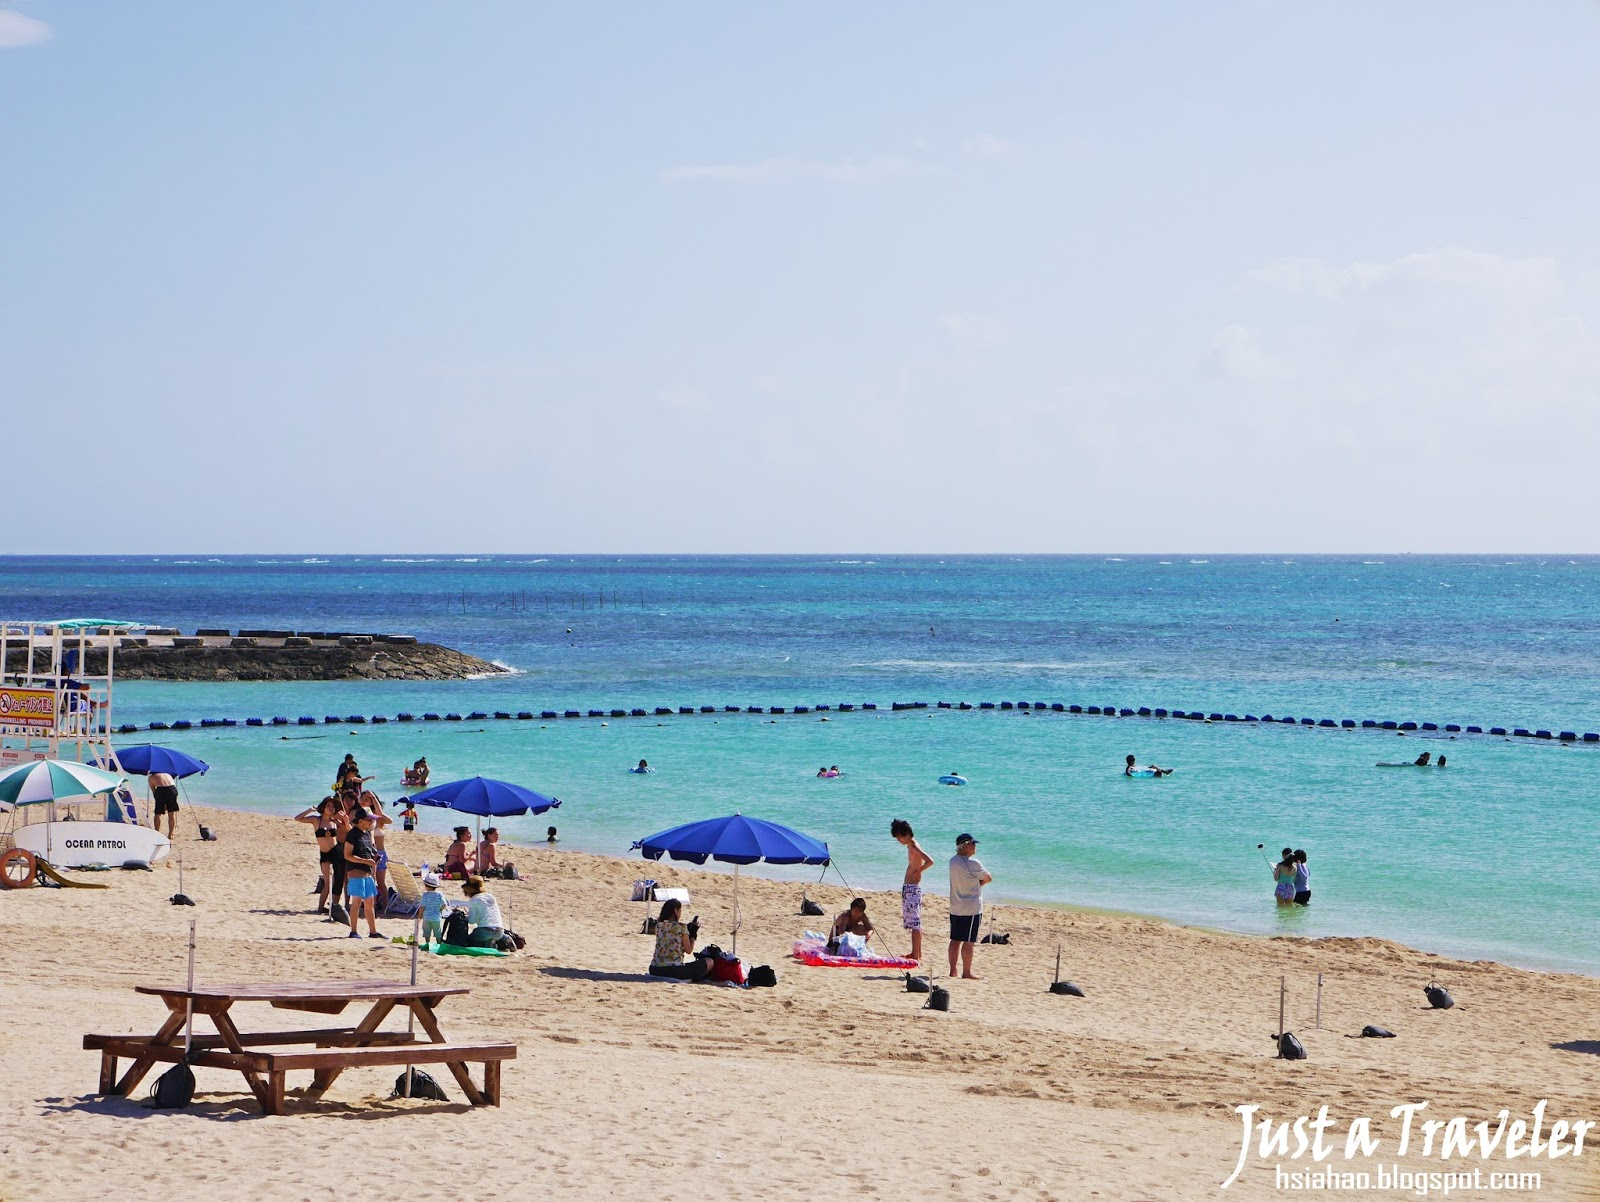 沖繩-海灘-推薦-殘波海灘-Zanpa-Beach-残波ビーチ-Okinawa-beach-recommendation